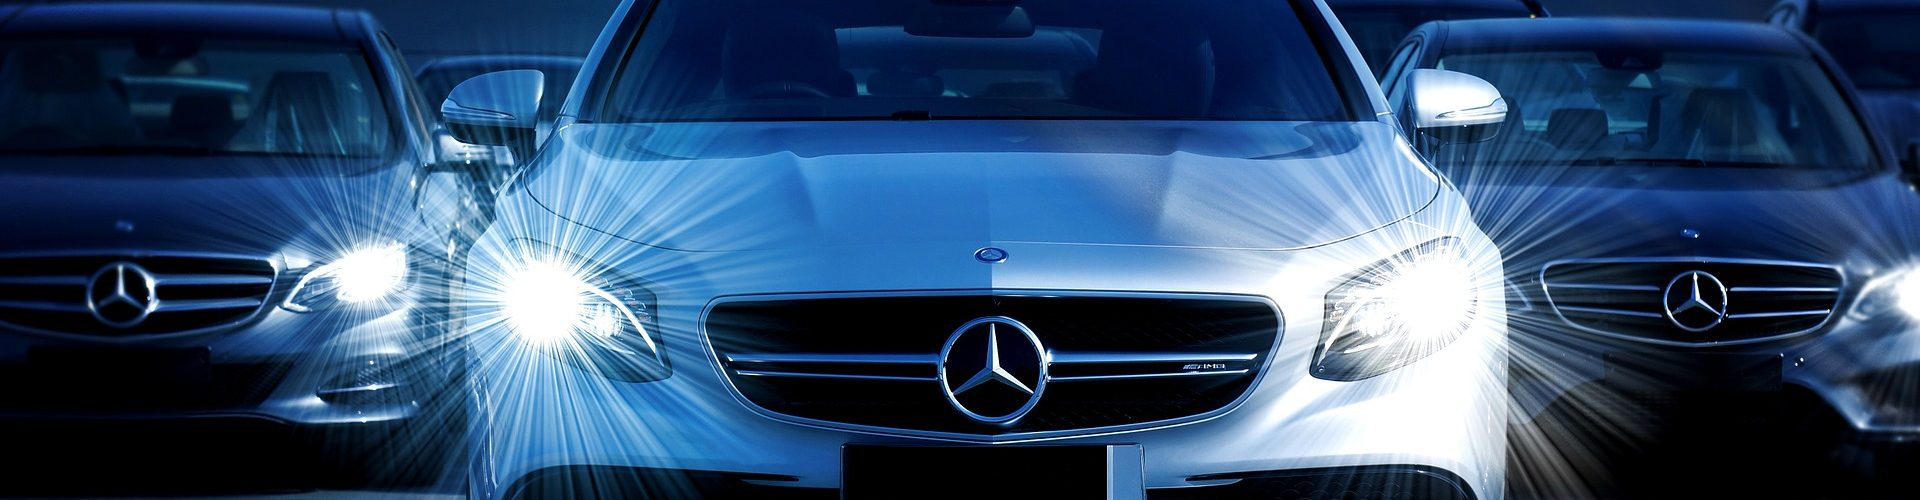 Où acheter une voiture occasion en Allemagne ?